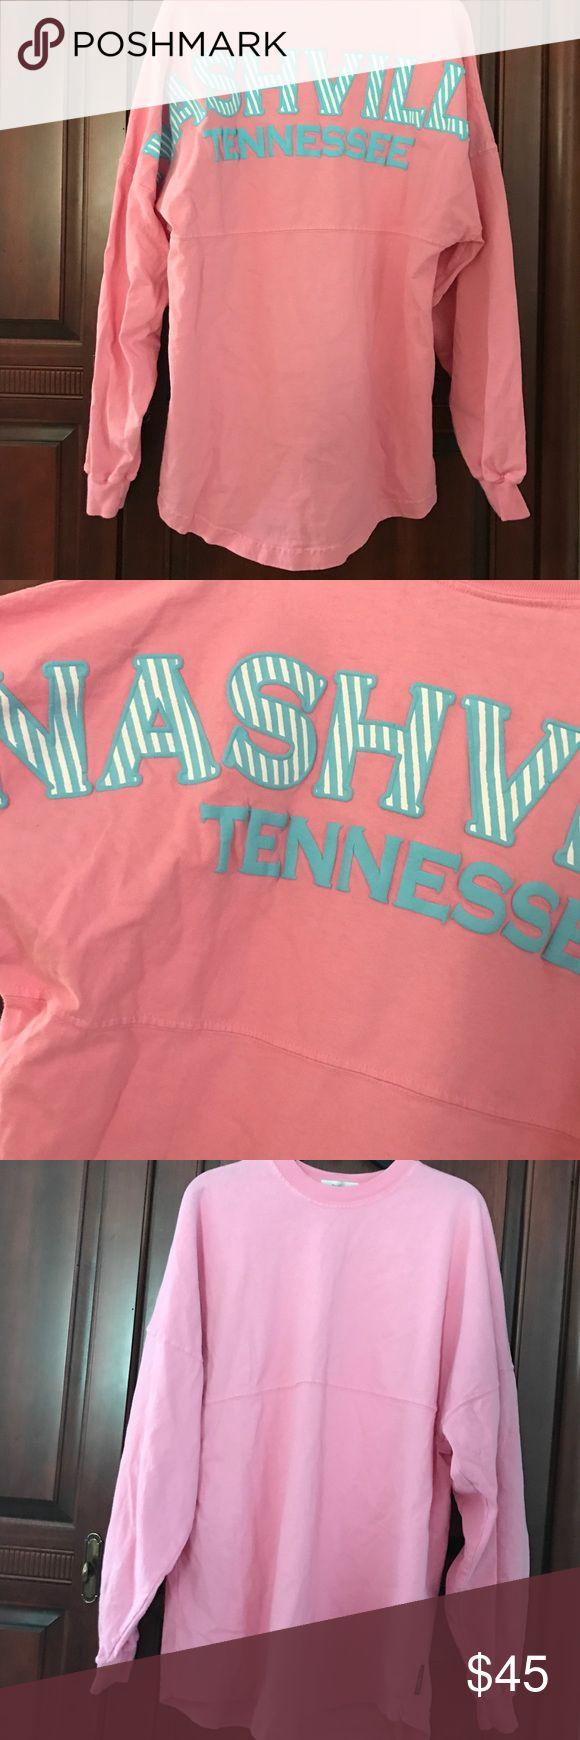 Nashville Tennessee Spirit Jersey Worn once Nashville, TN spirit jersey. Size XS. Reason for selling: don't wear enough. SPIRIT JERSEY Tops Tees - Long Sleeve